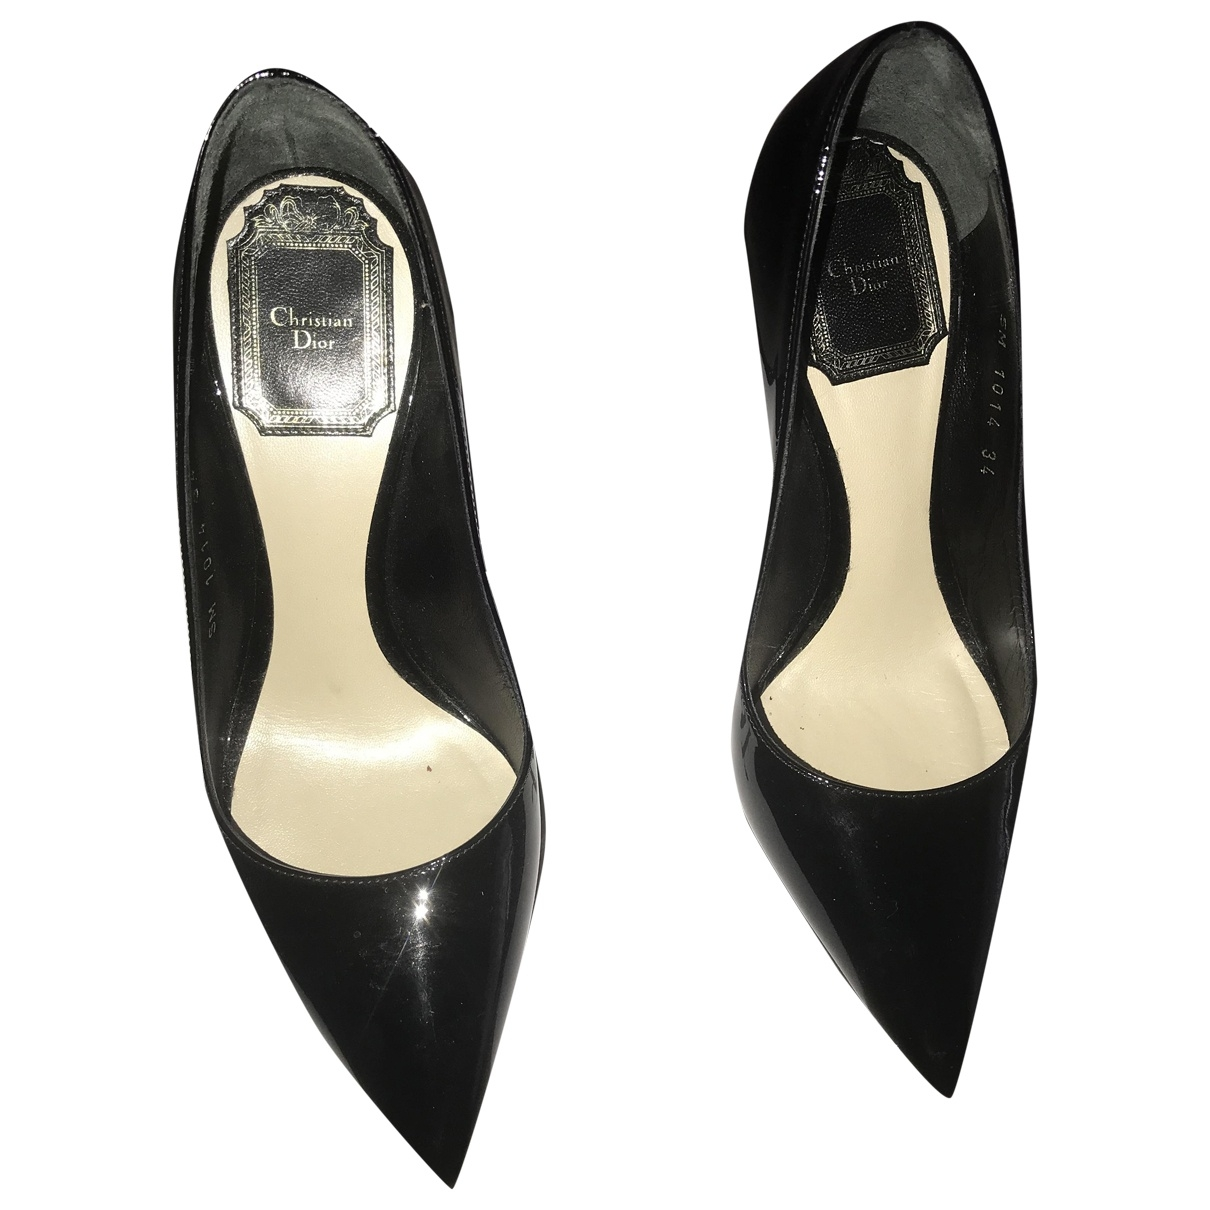 Tacones Dior D-Stiletto de Charol Dior